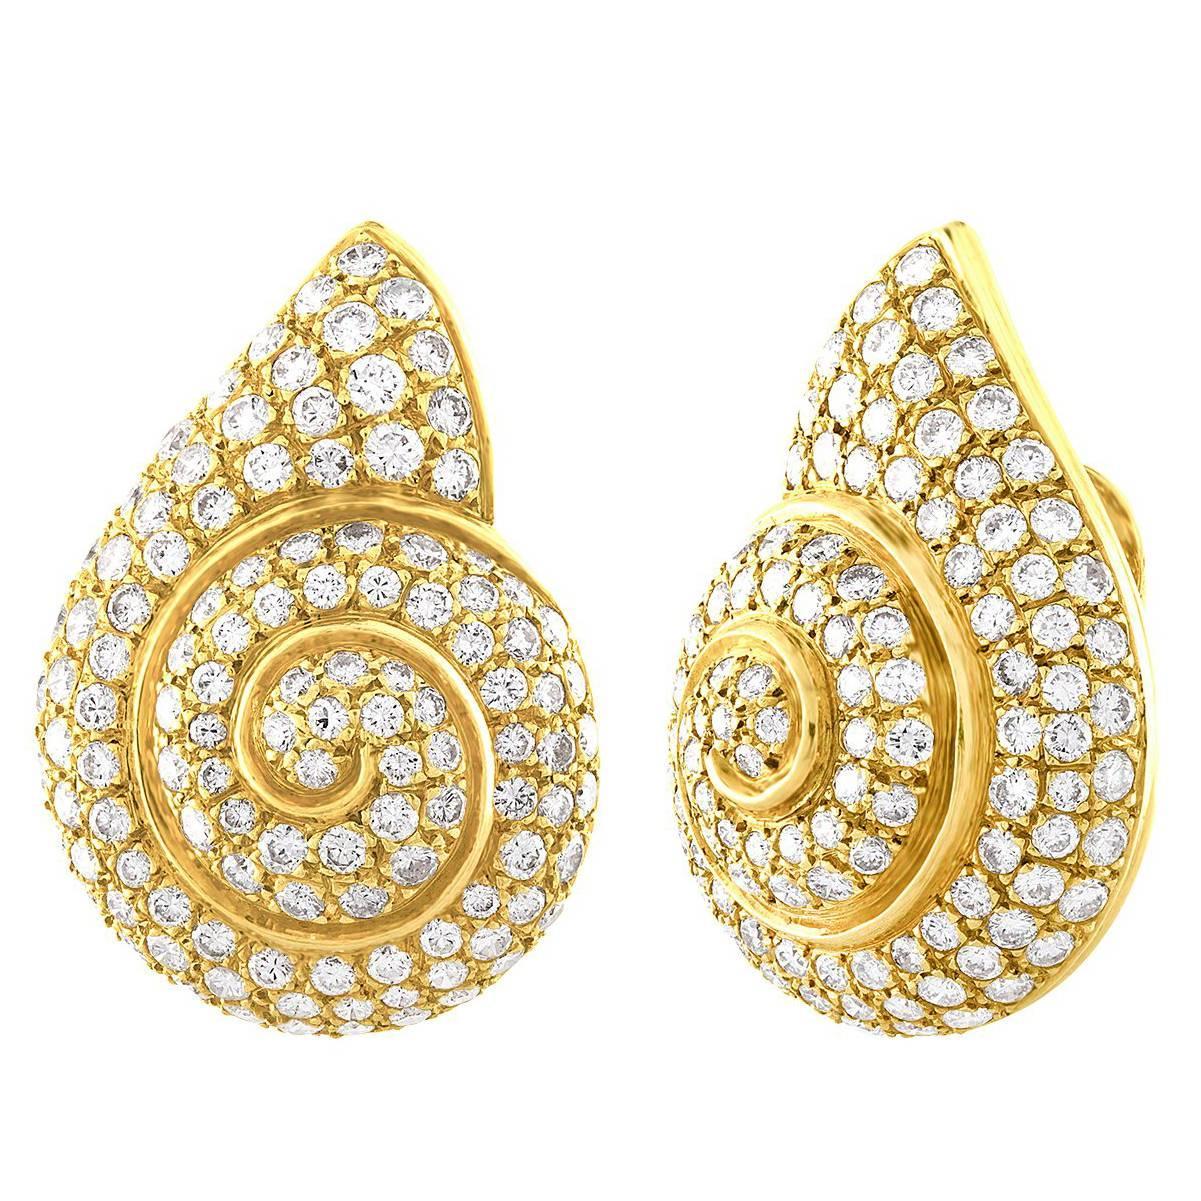 English 10.00 Carat Diamond Gold Snail Clip-On Earrings